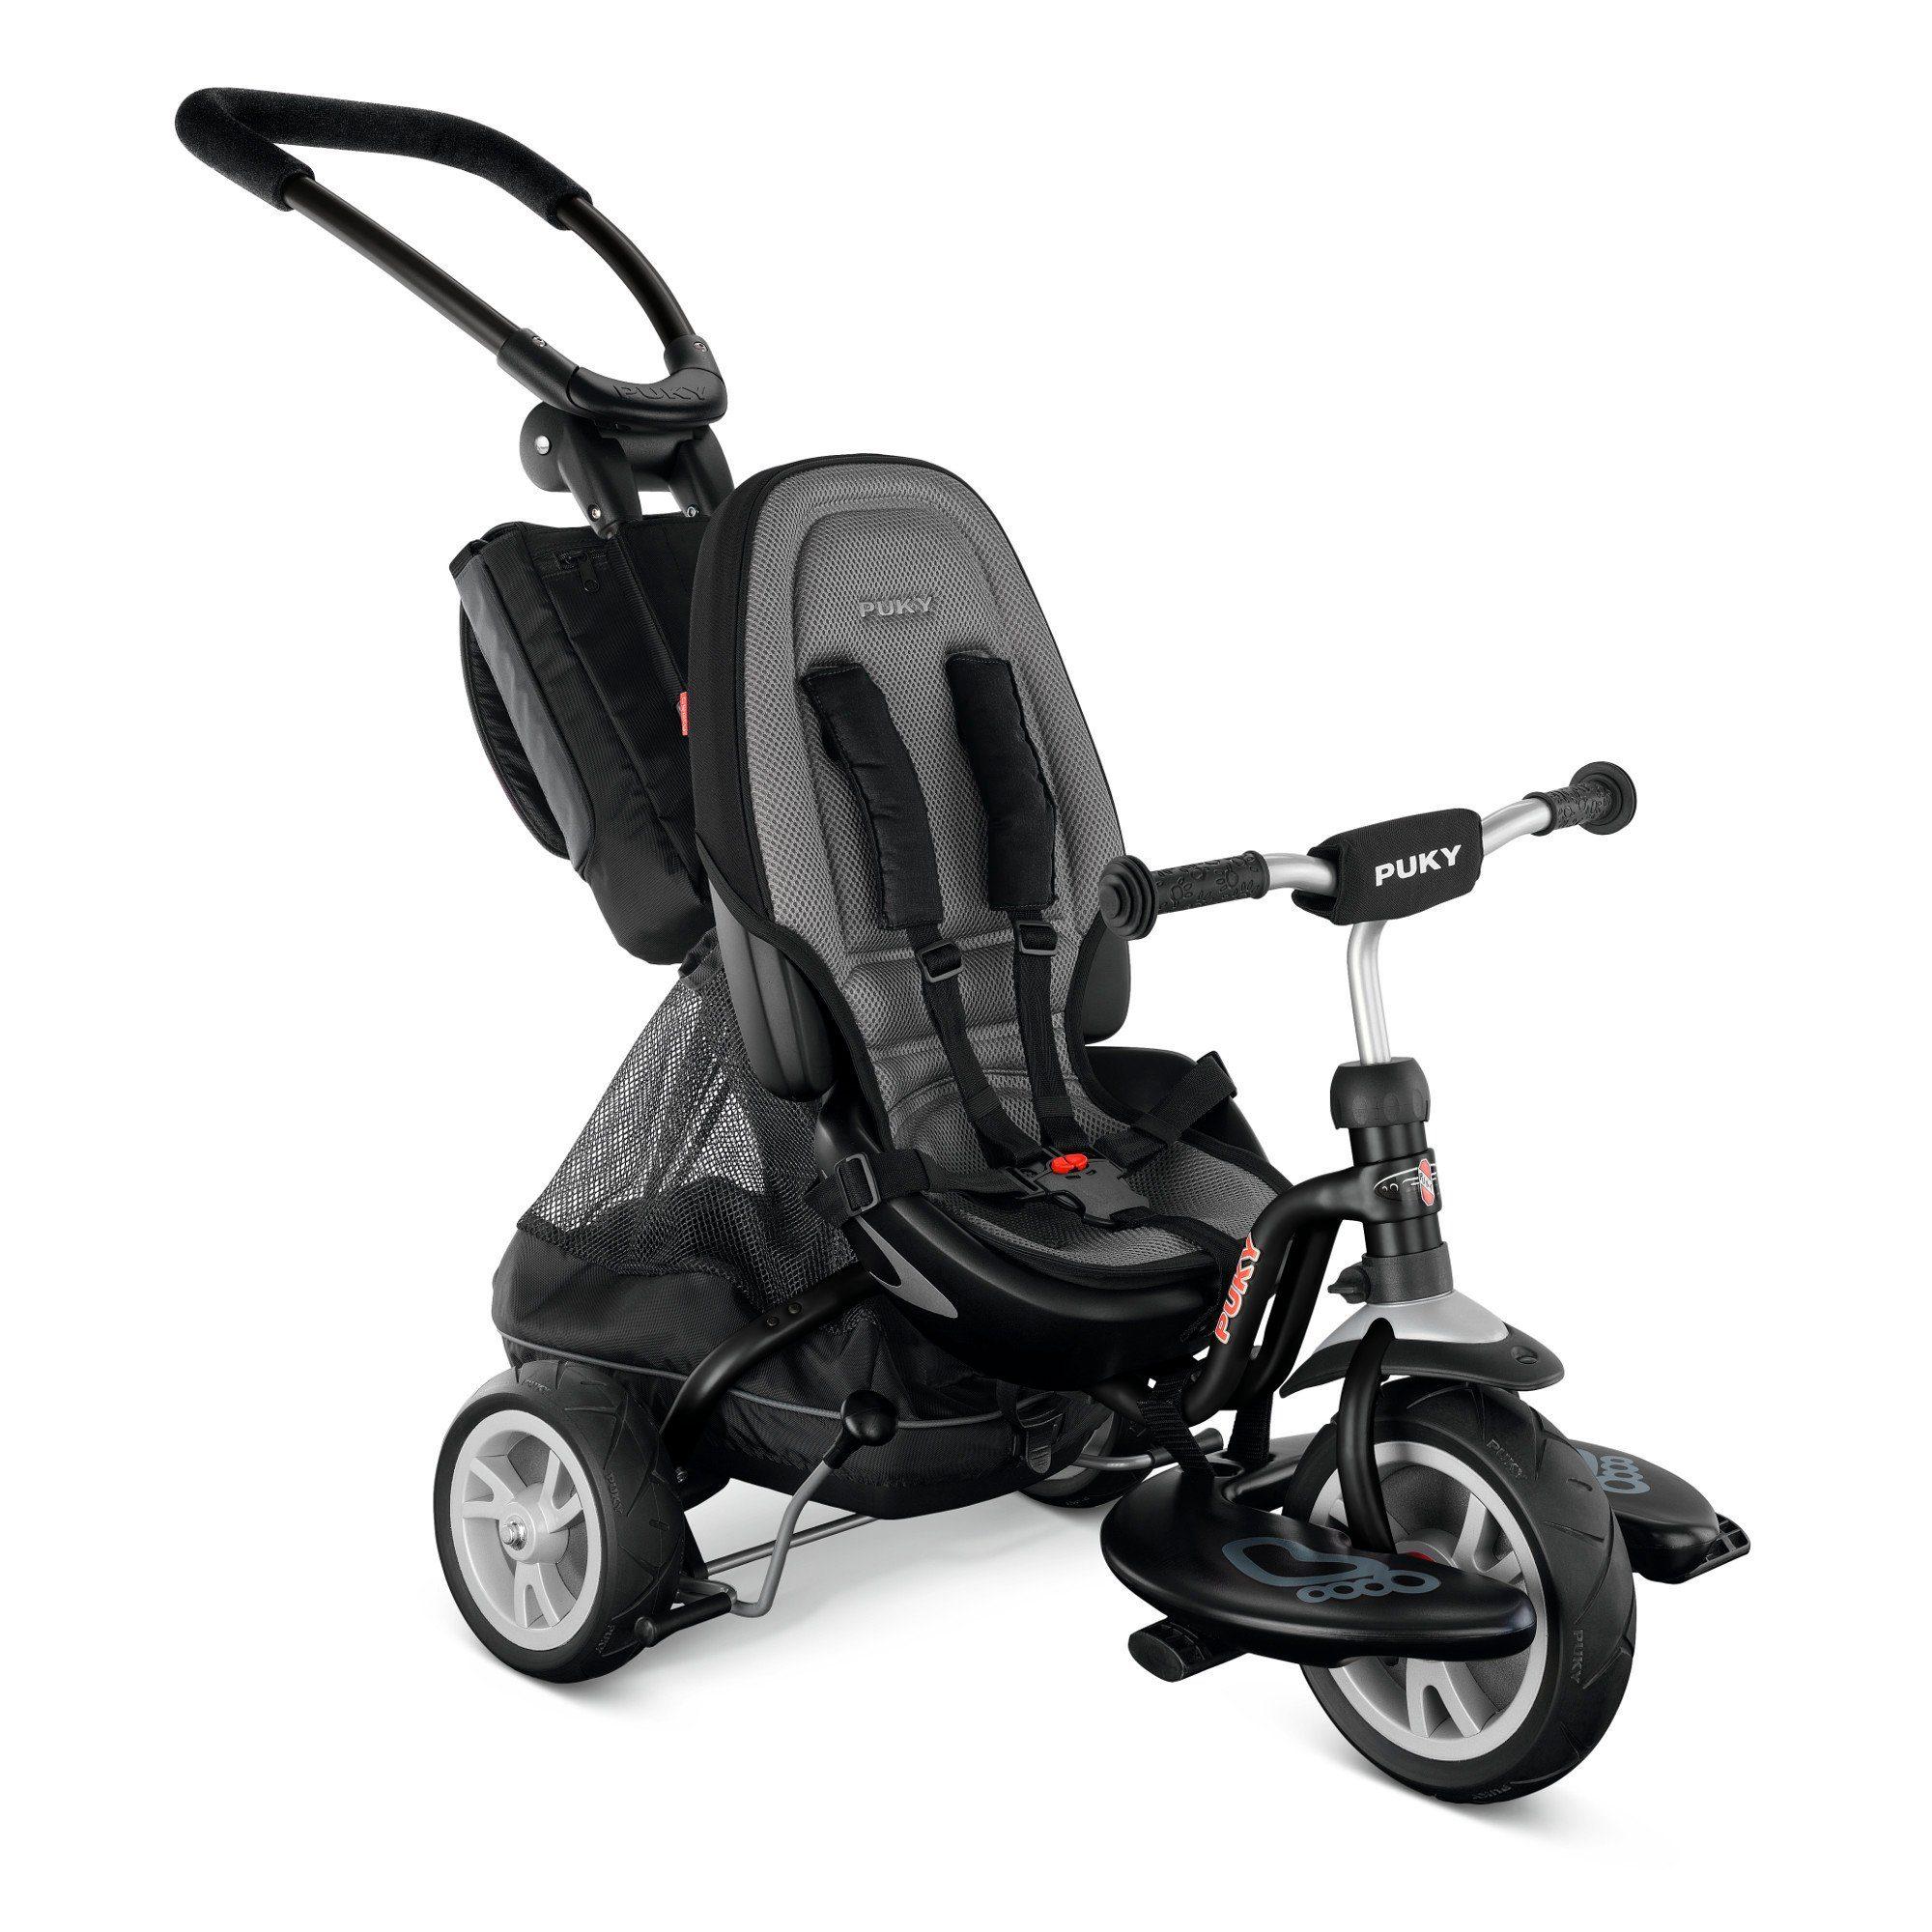 Puky Kinderfahrzeug »CAT S6 Ceety Limited Edition«